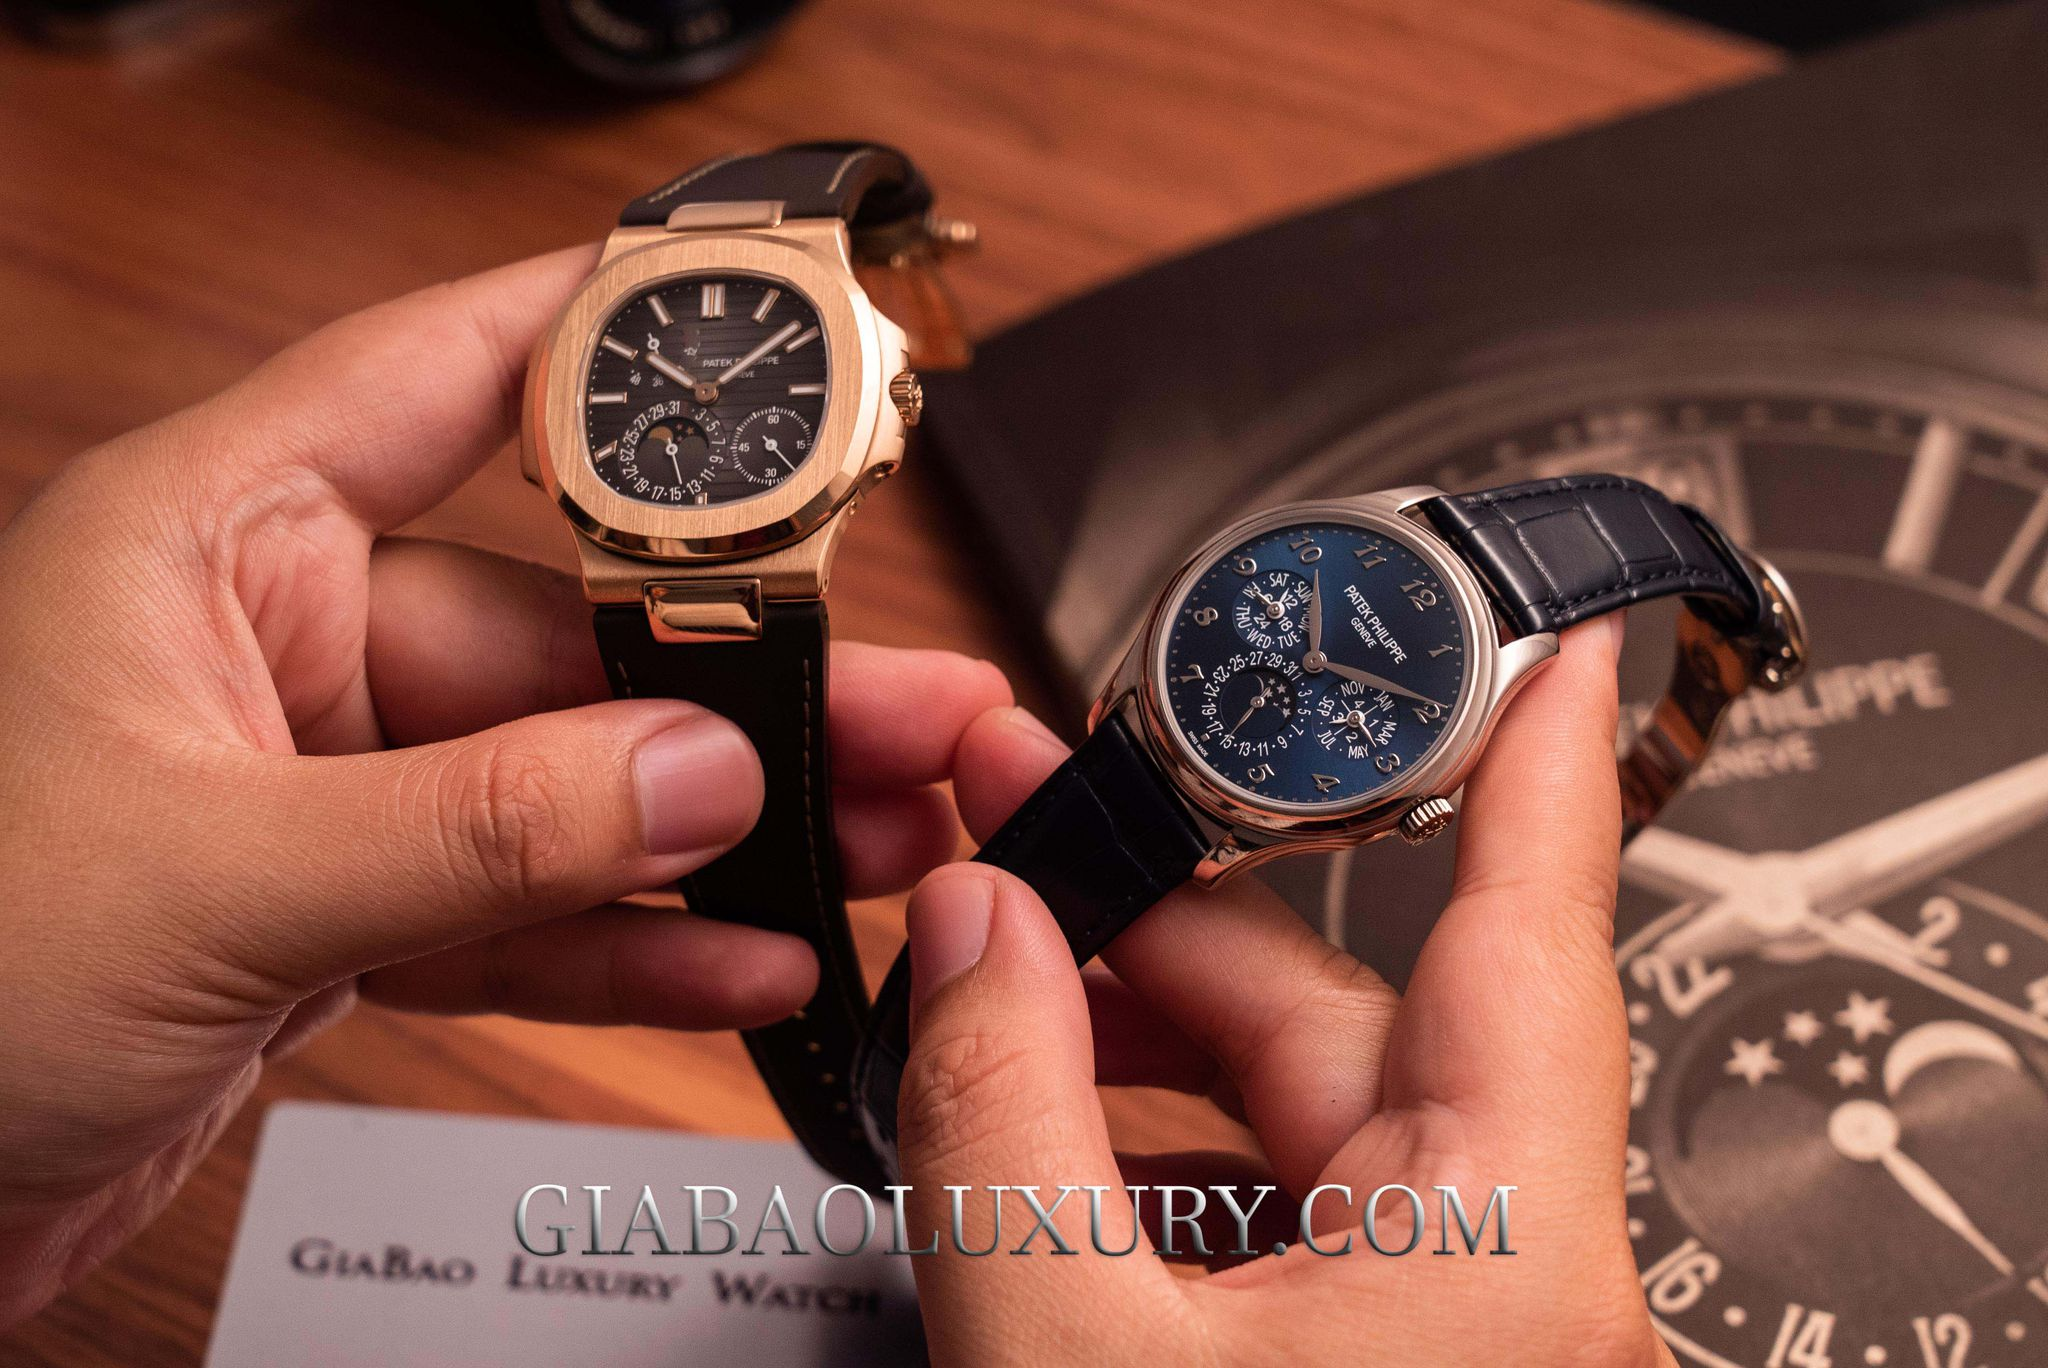 so sanh 2 mẫu đồng hồ Patek Philippe Nautilus 5712R và đồng hồ Patek Philippe Grand Complications 5327G